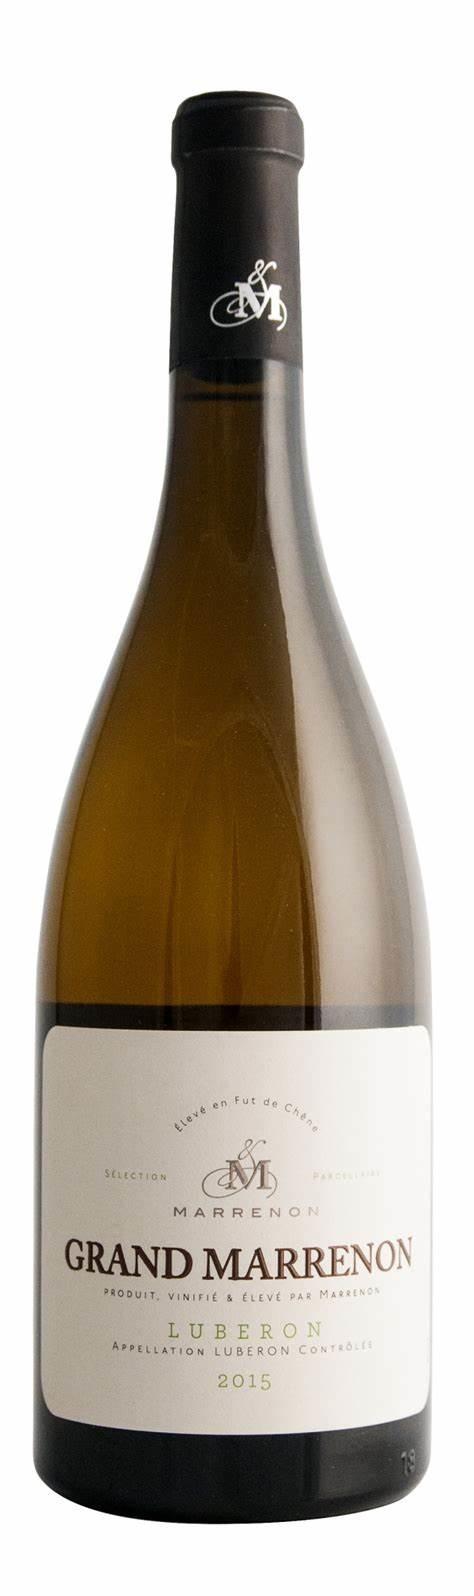 Marrenon Grand Marrenon Blanc, 2019, Luberon, Frankrijk, Witte wijn